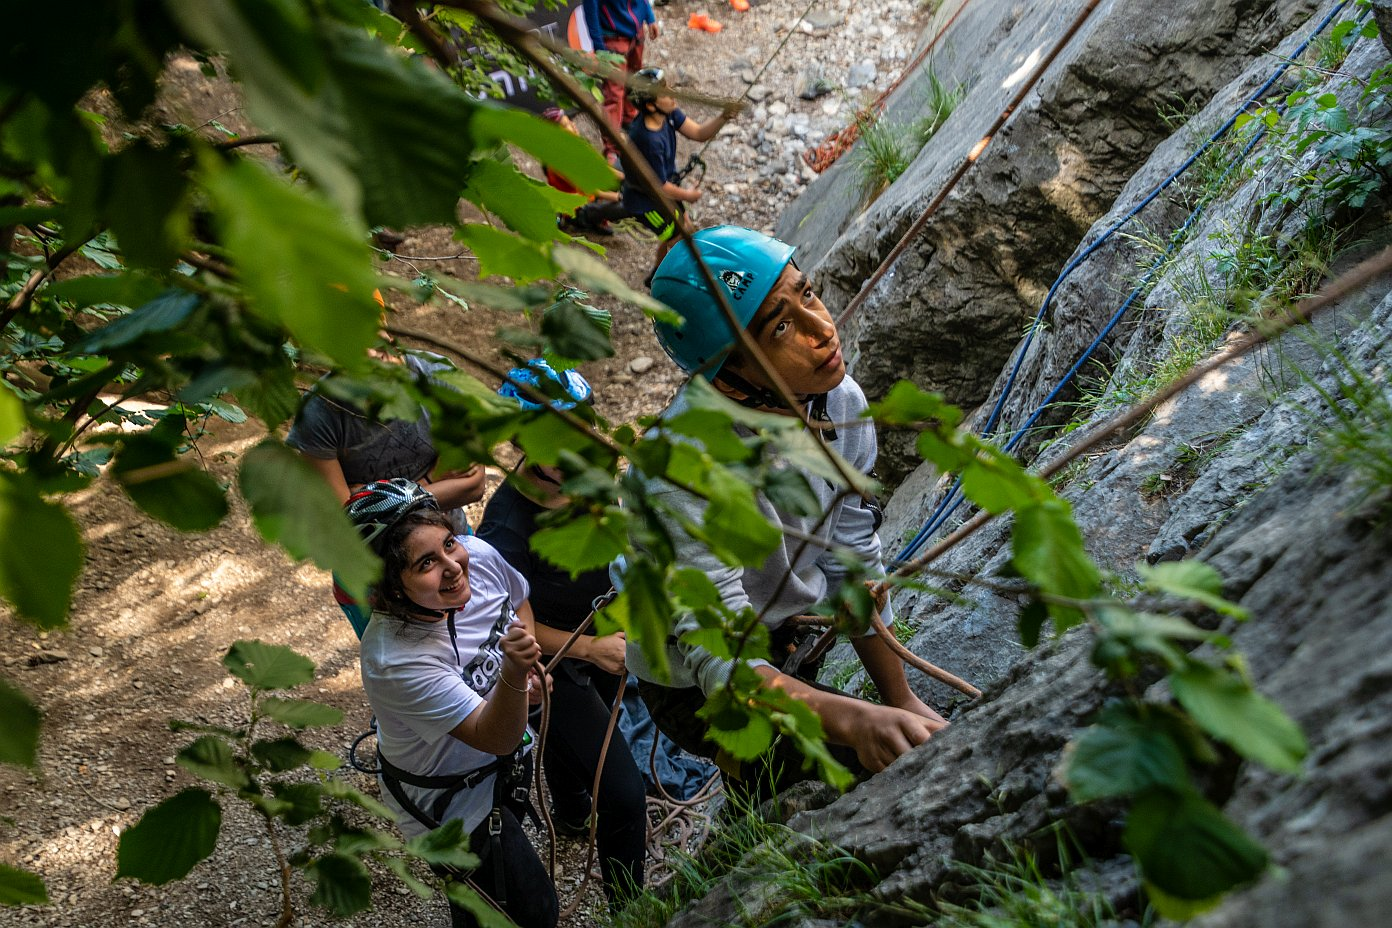 Klettern stärkt die Gemeinschaft, Foto: SPORTUNION Tirol | Climbers Paradise